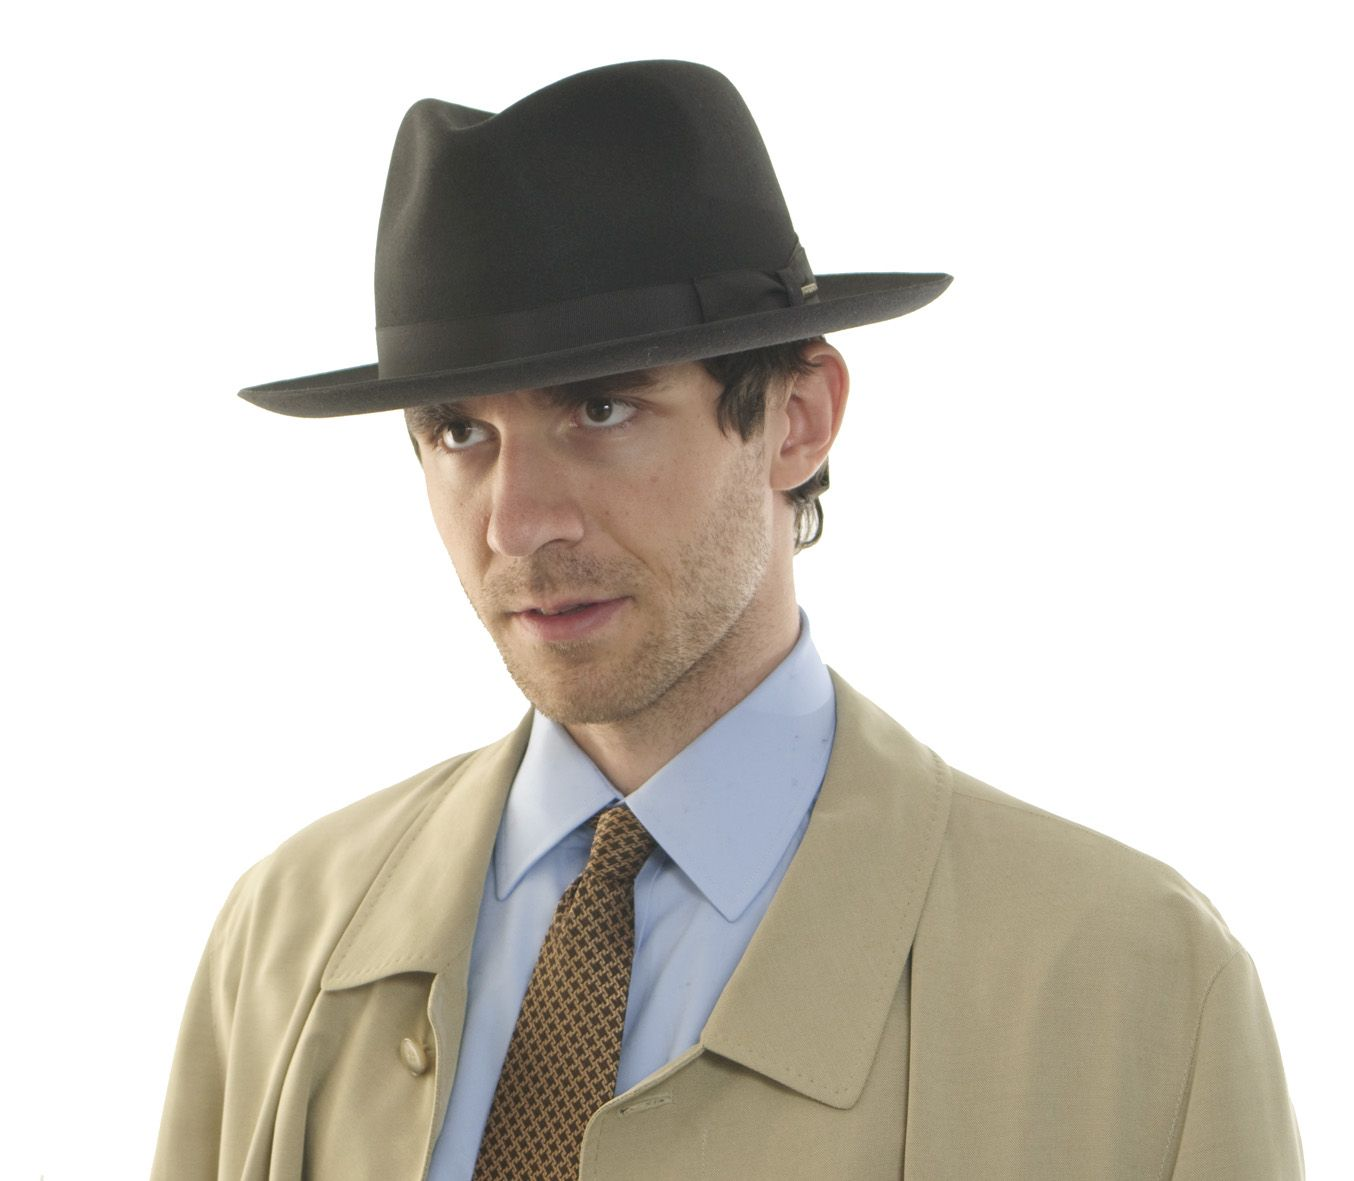 Stetson Penn - stylish  fedora hat in grey.  d034f33ea5c2